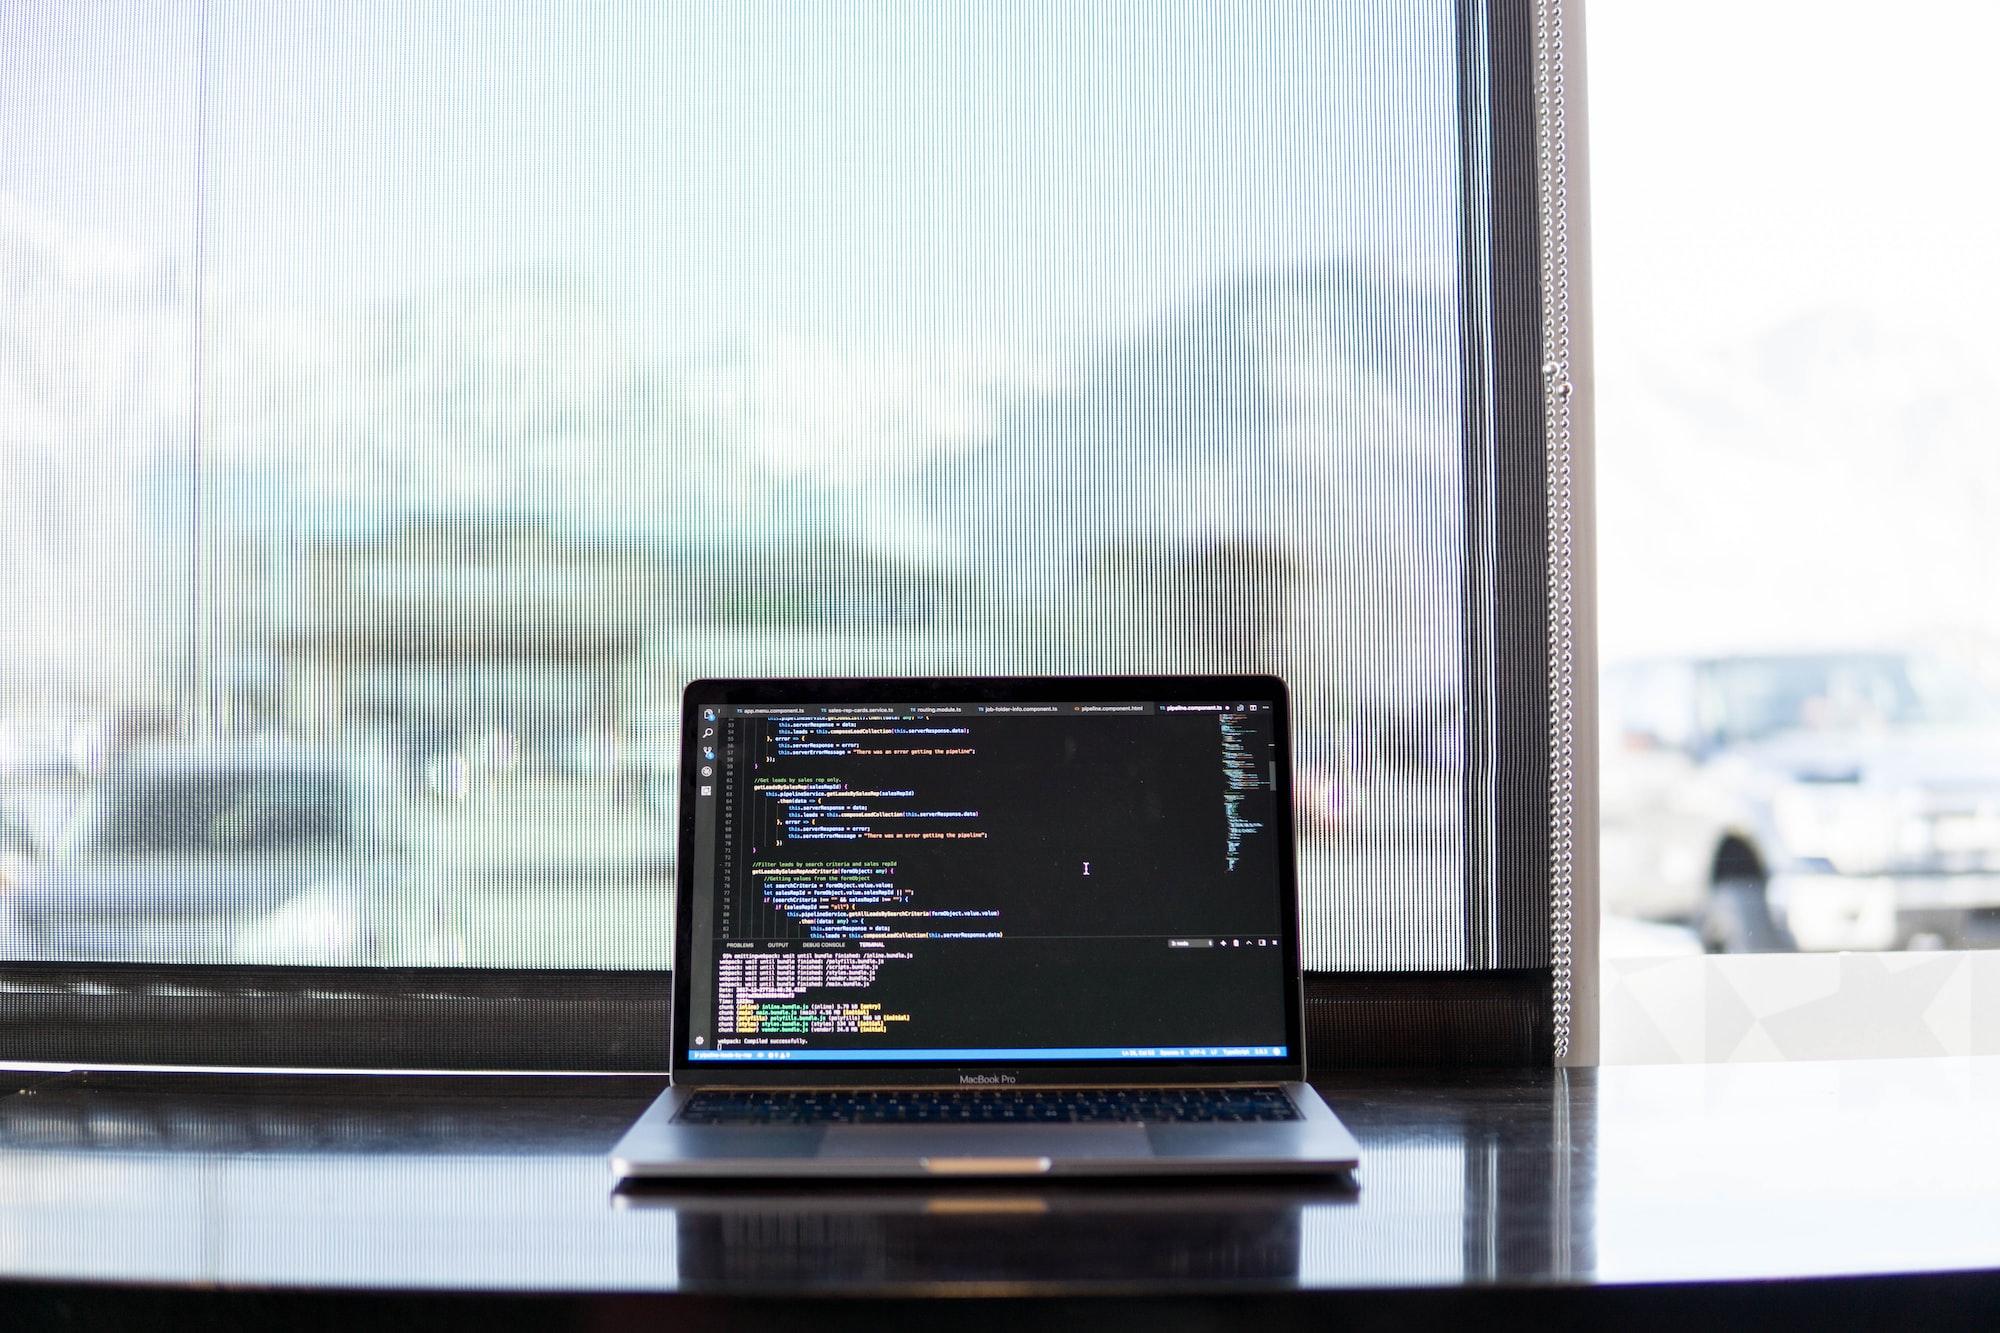 Protocol Oriented Programming + Unit Testing = ♥️